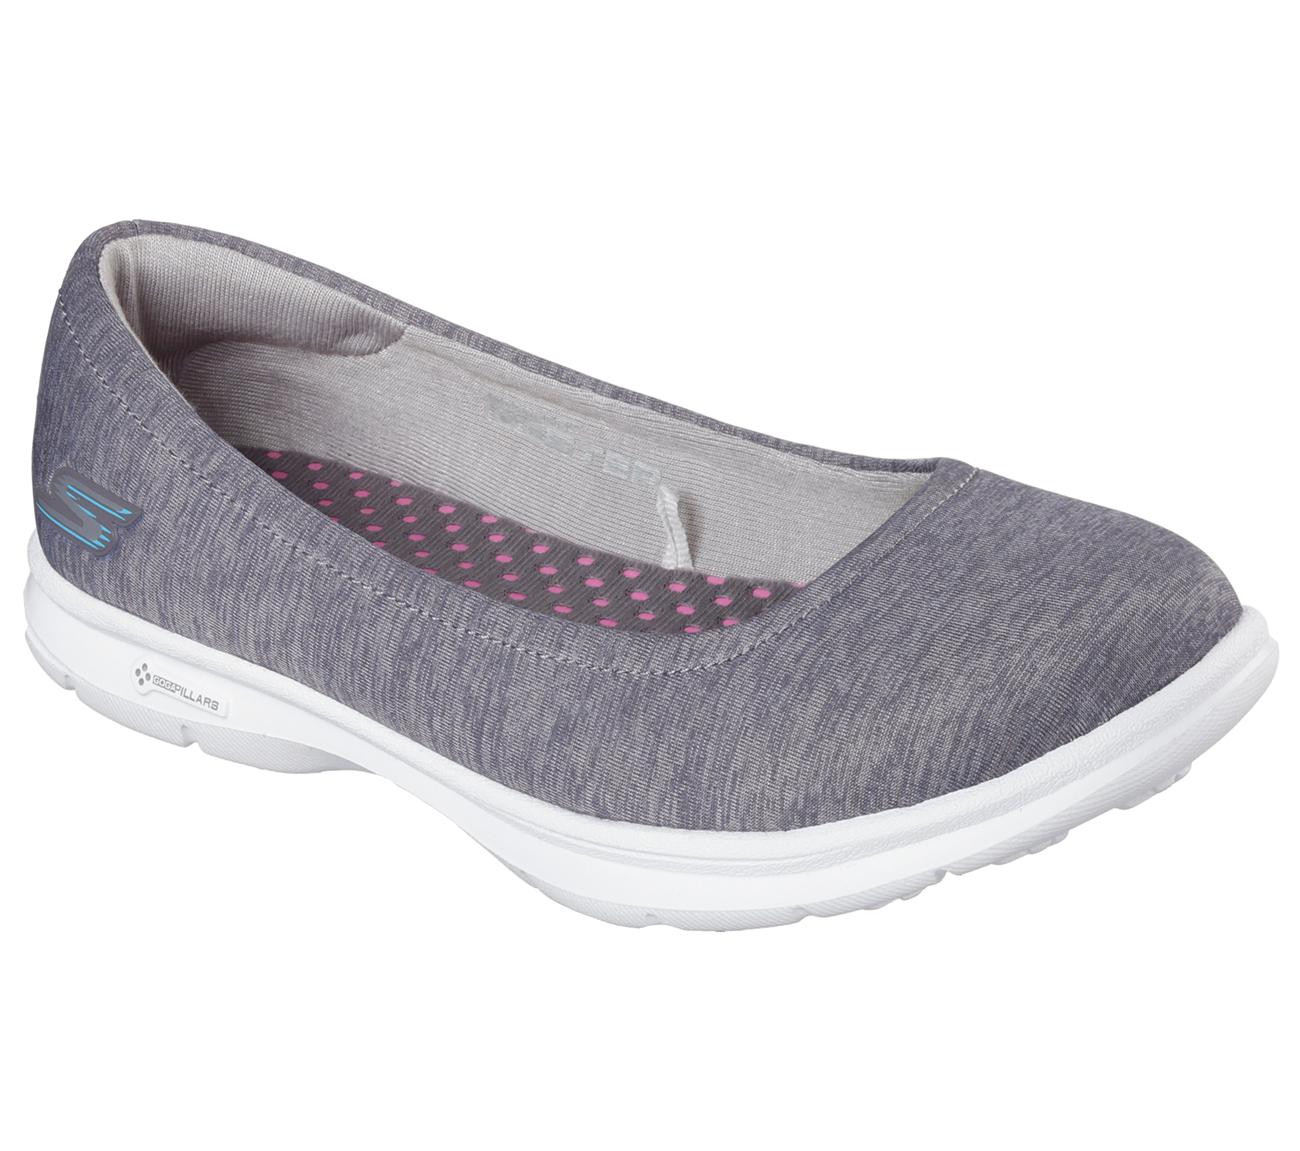 Buy Skechers Skechers Go Step Challenge Go Step Shoes